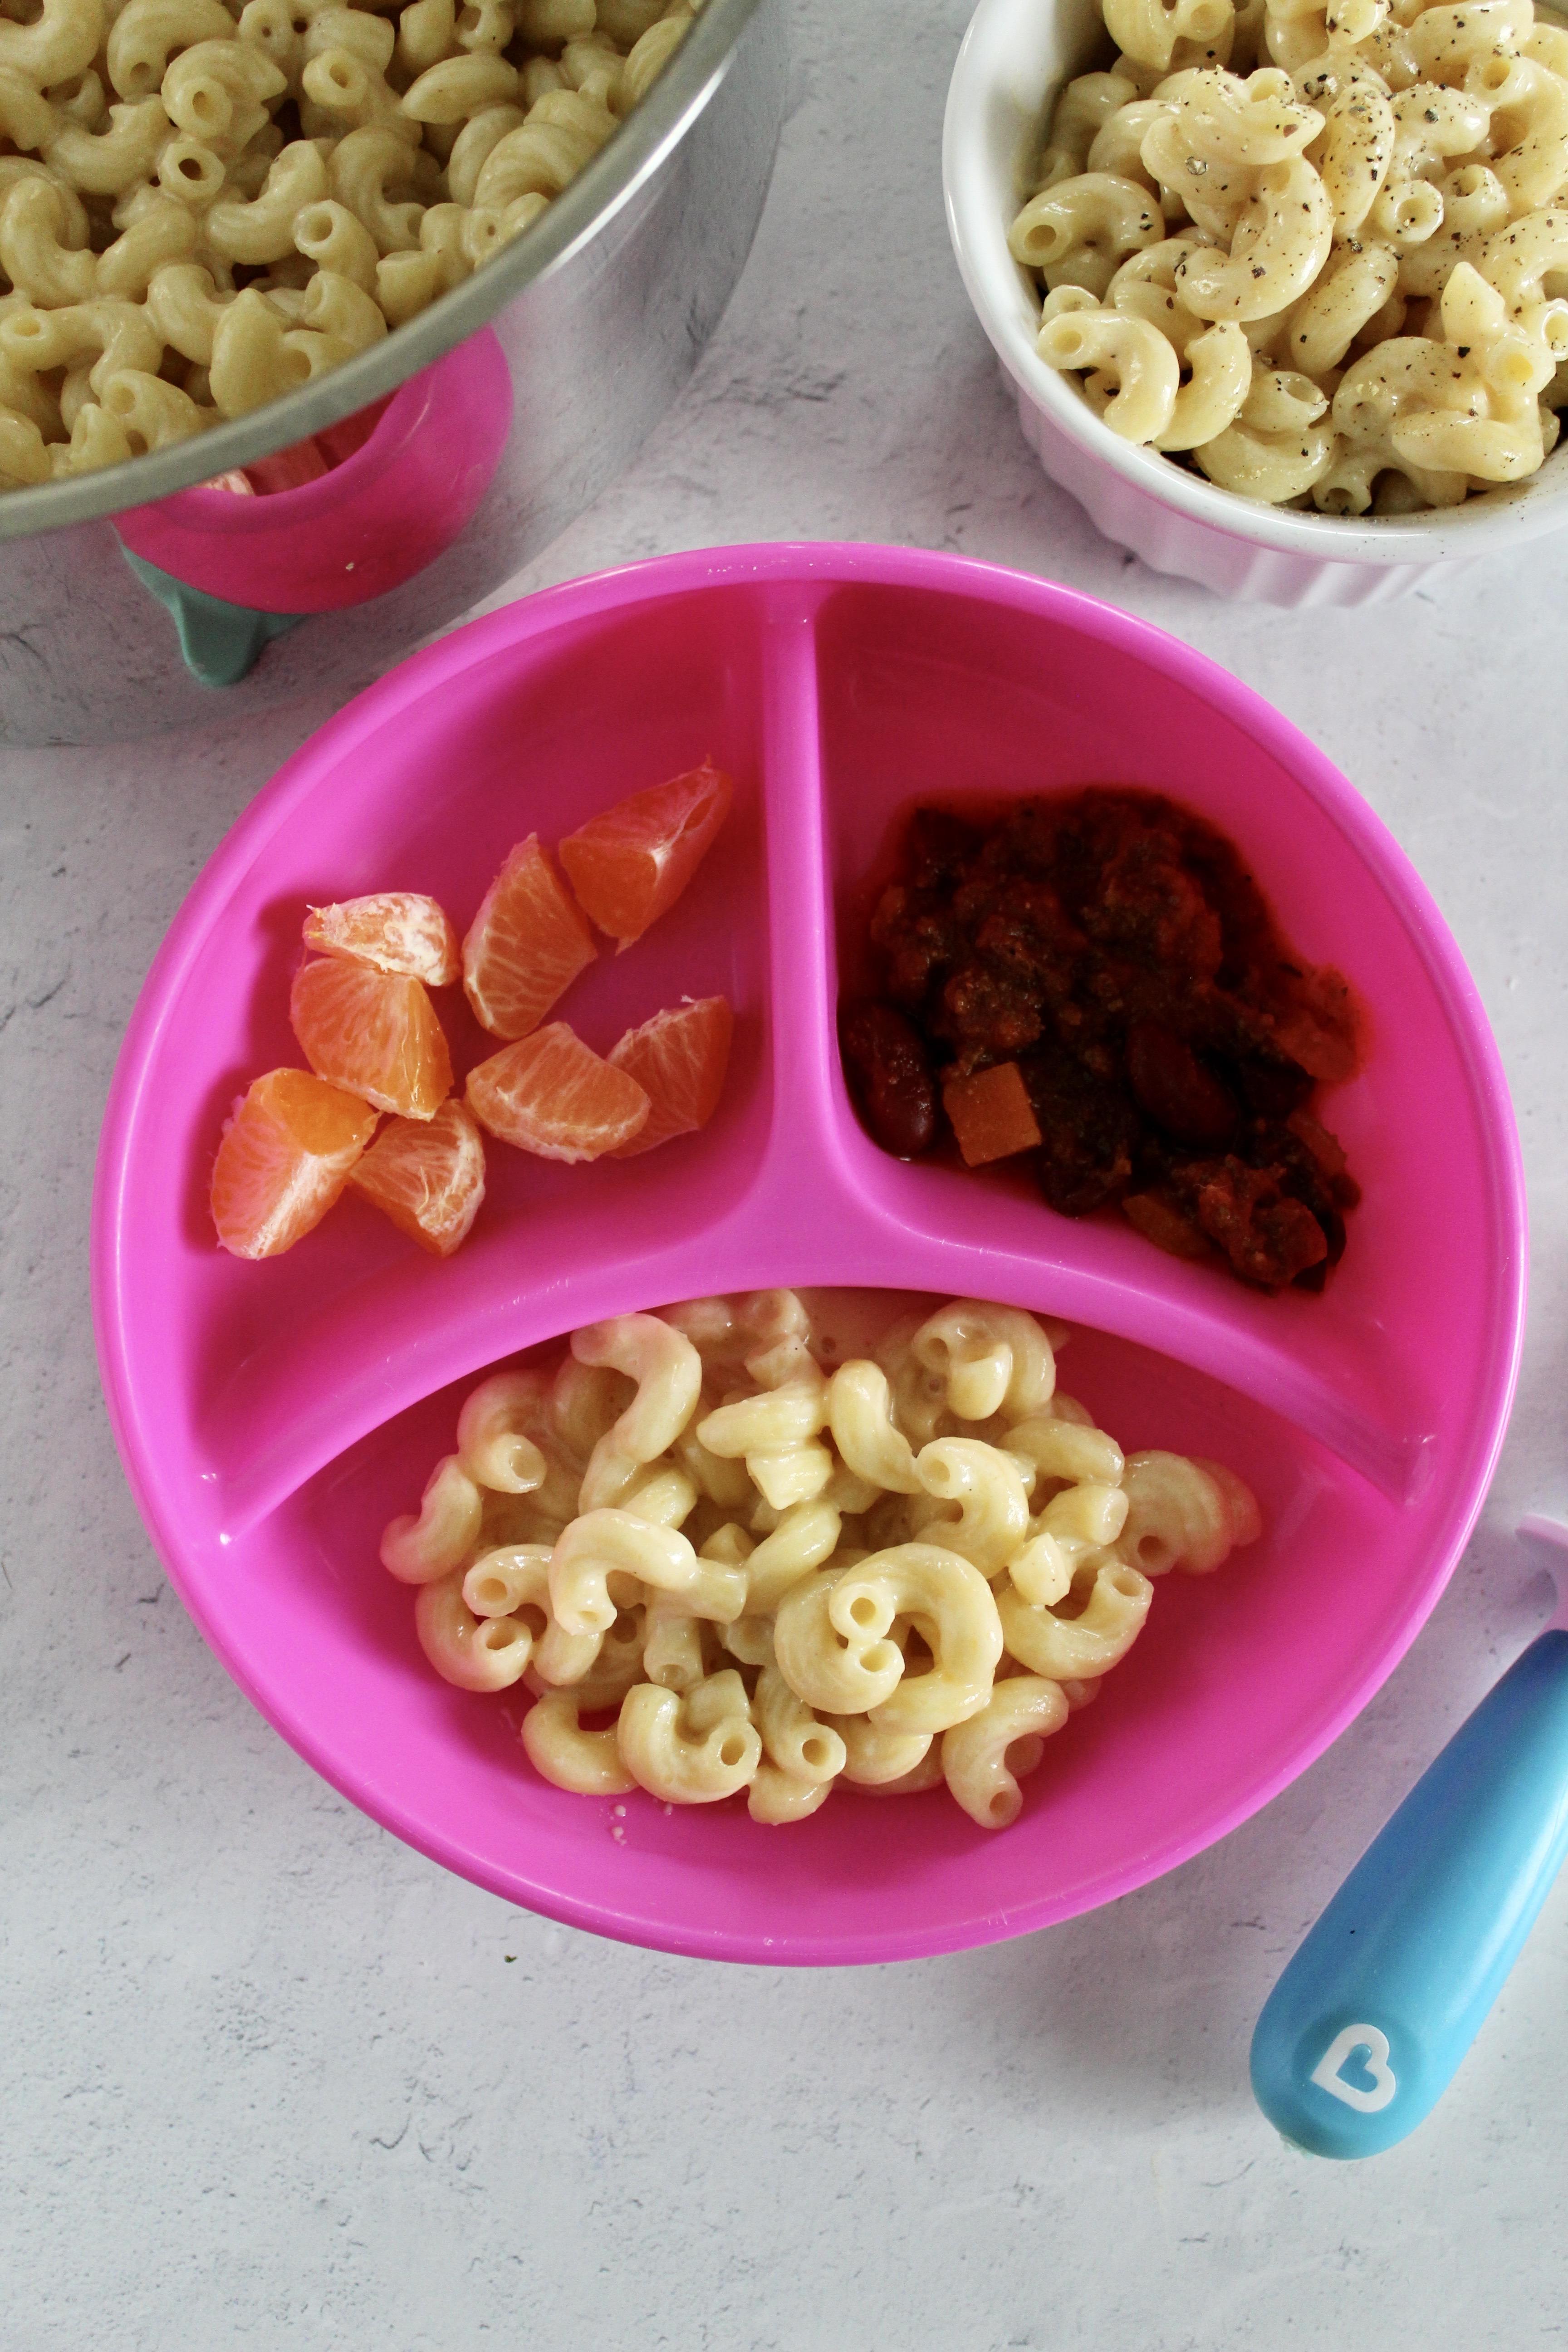 child's plate of Mac and cheese, orange, and chili